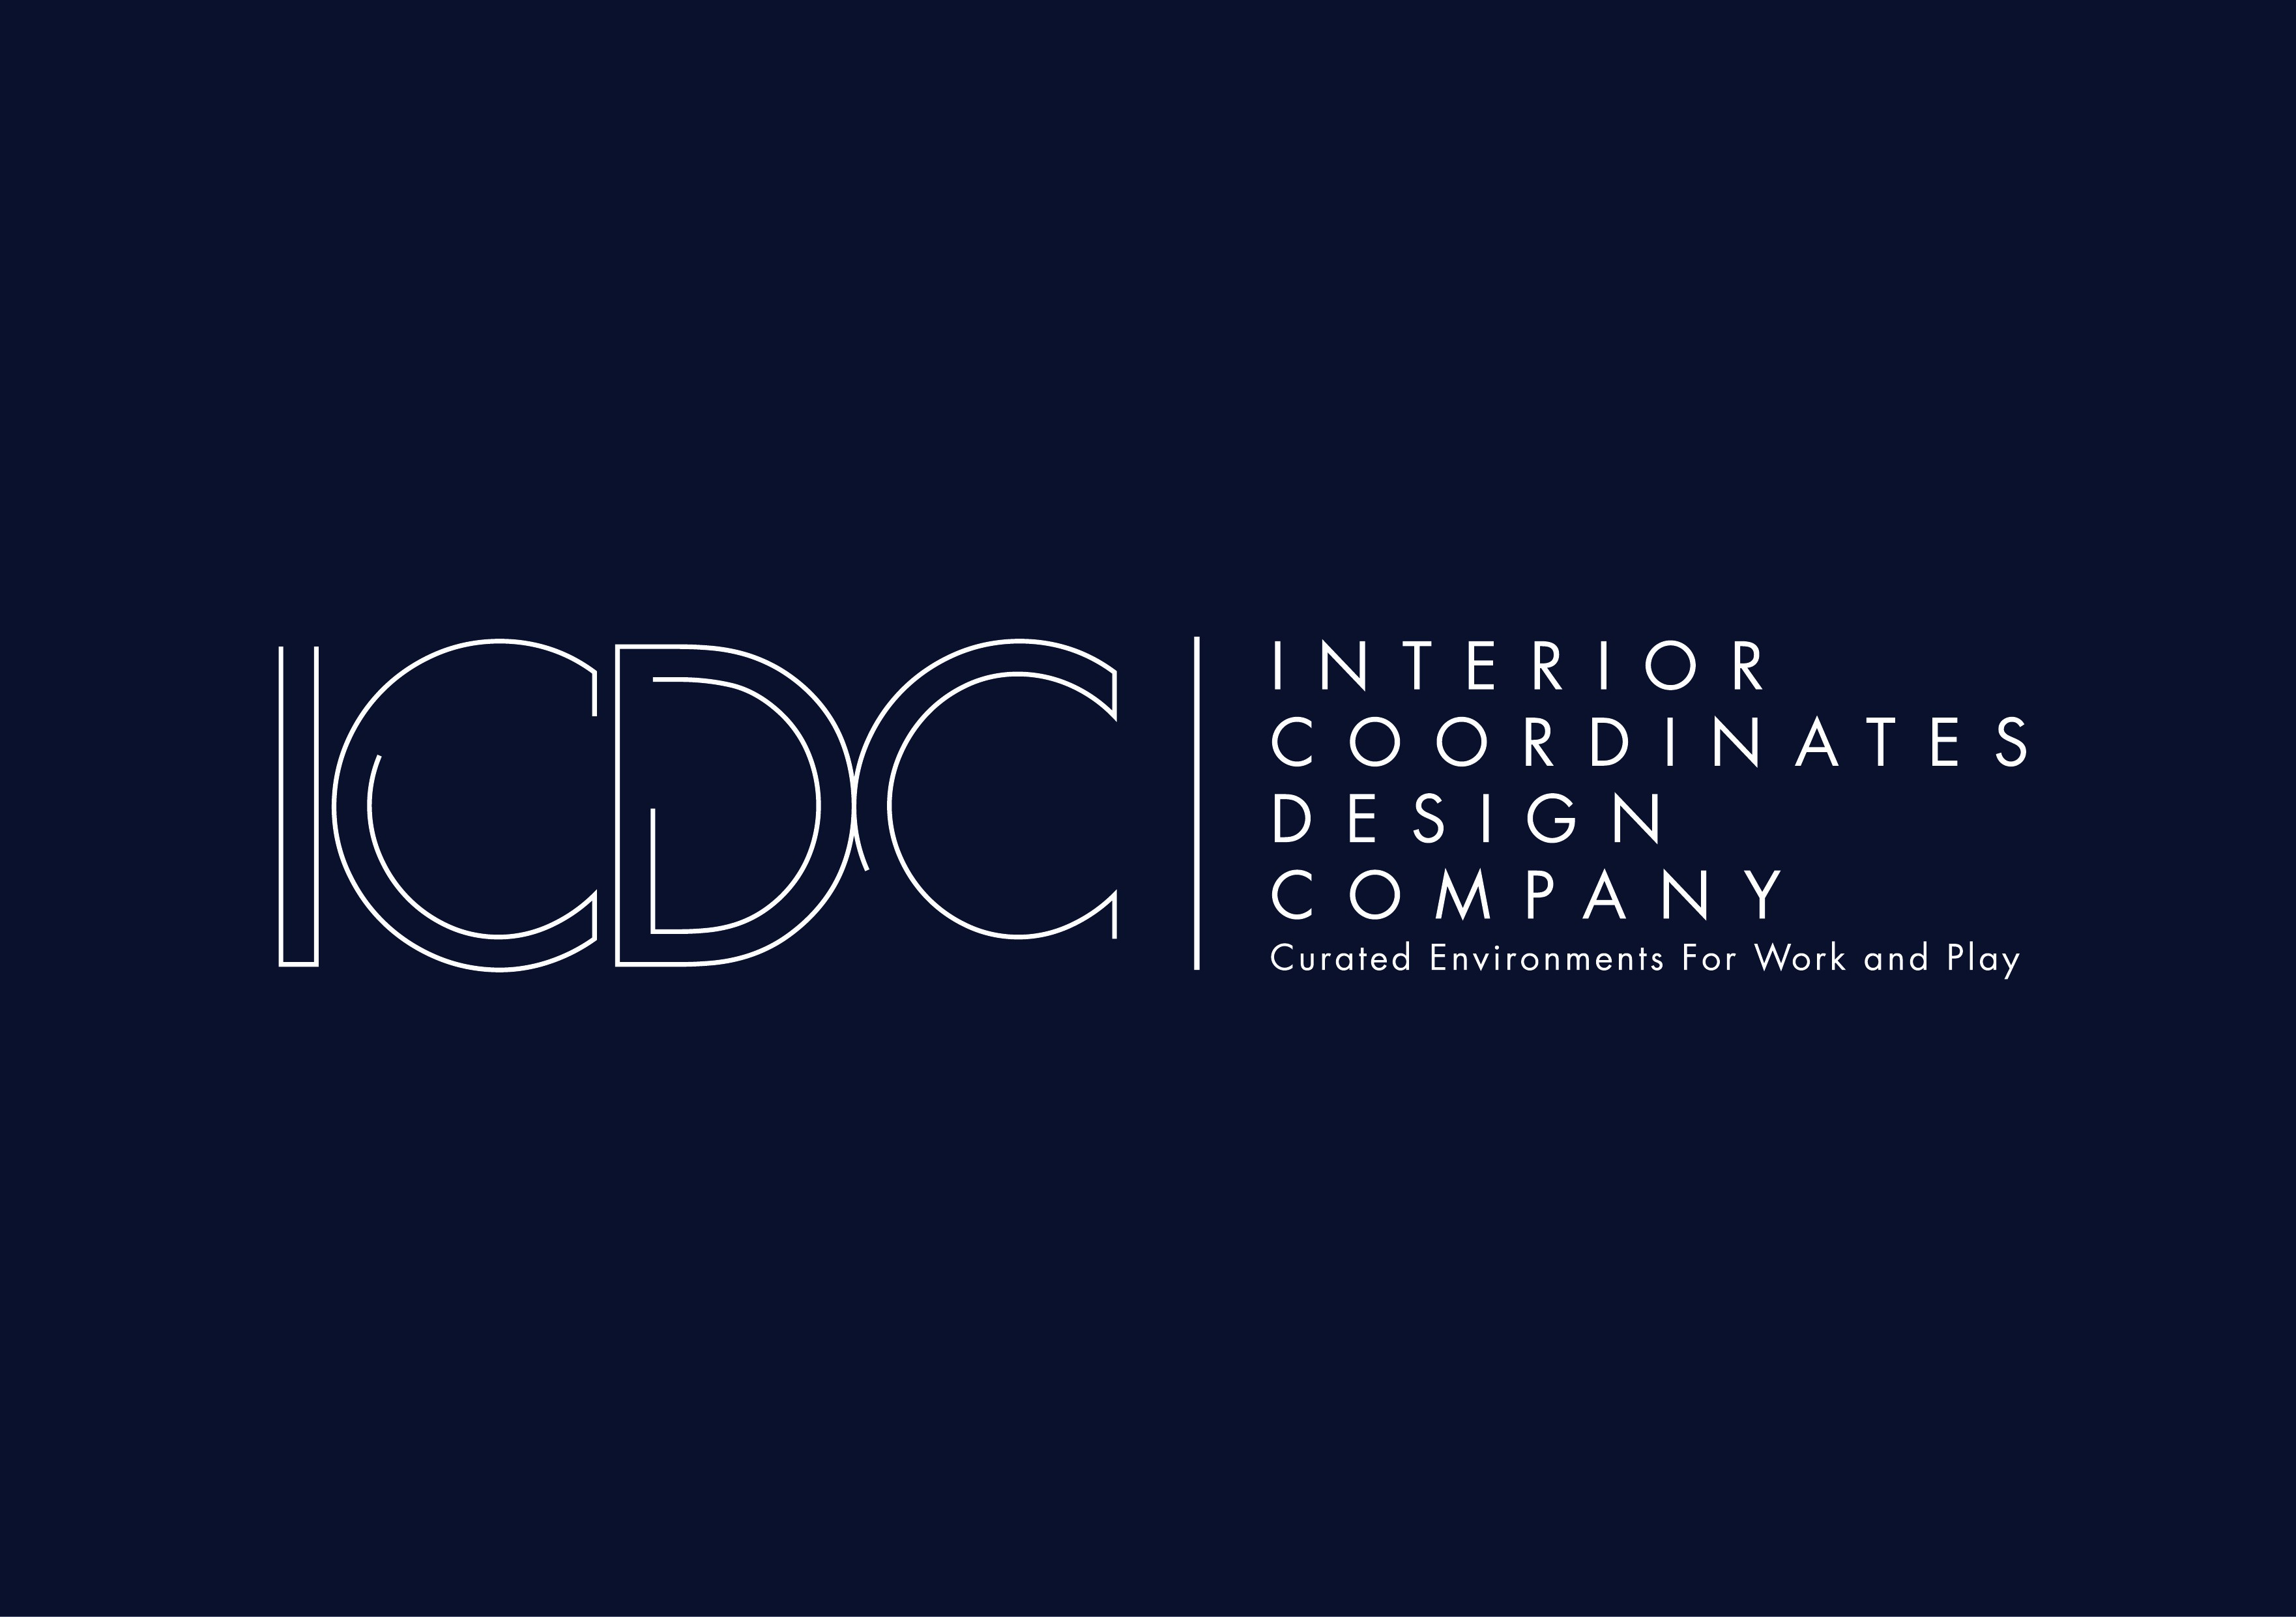 Clean and Professional Interior Design Logo